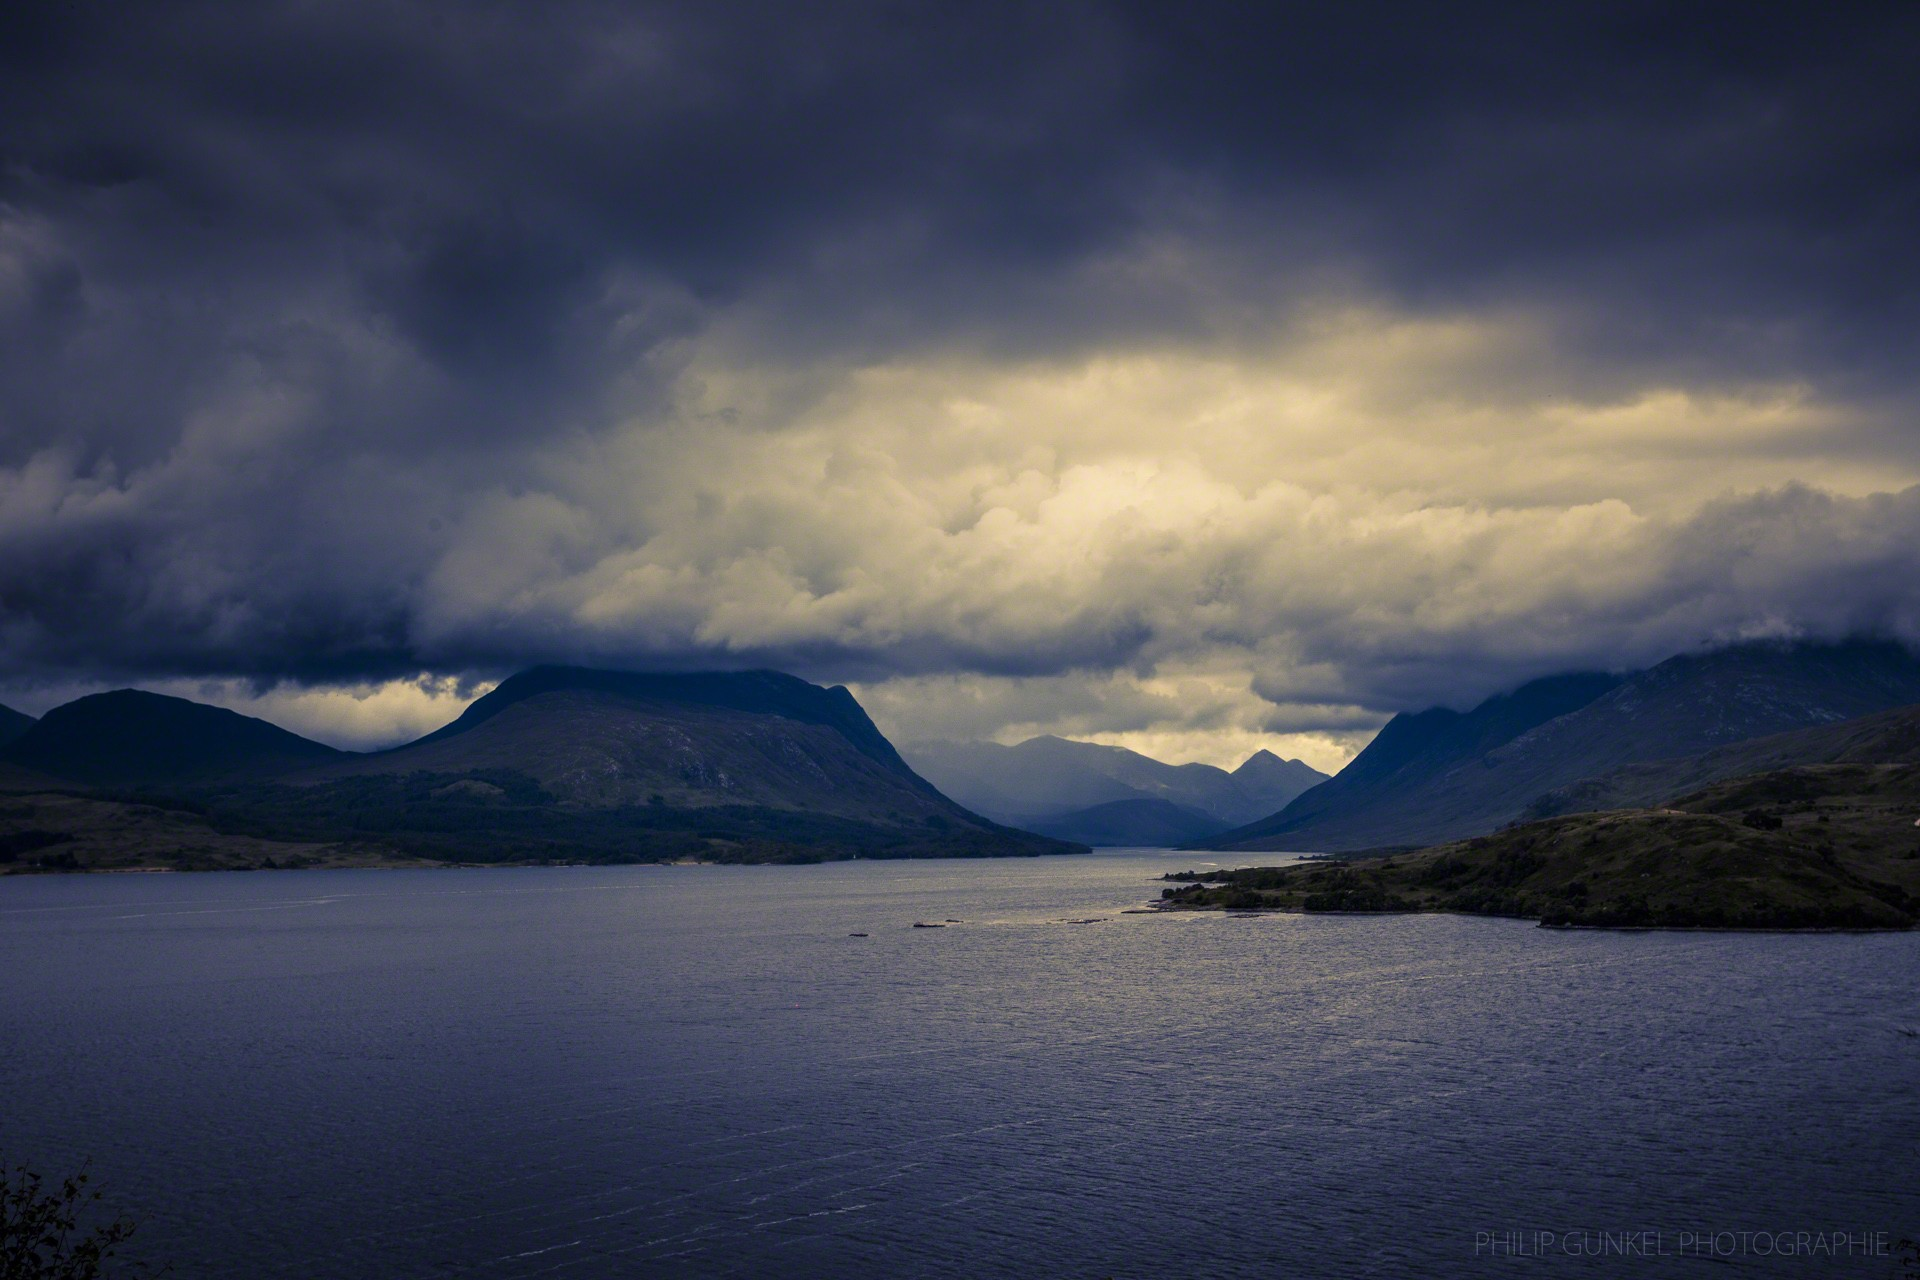 scotland_philip_gunkel_photographie_www.philipgunkel.de01